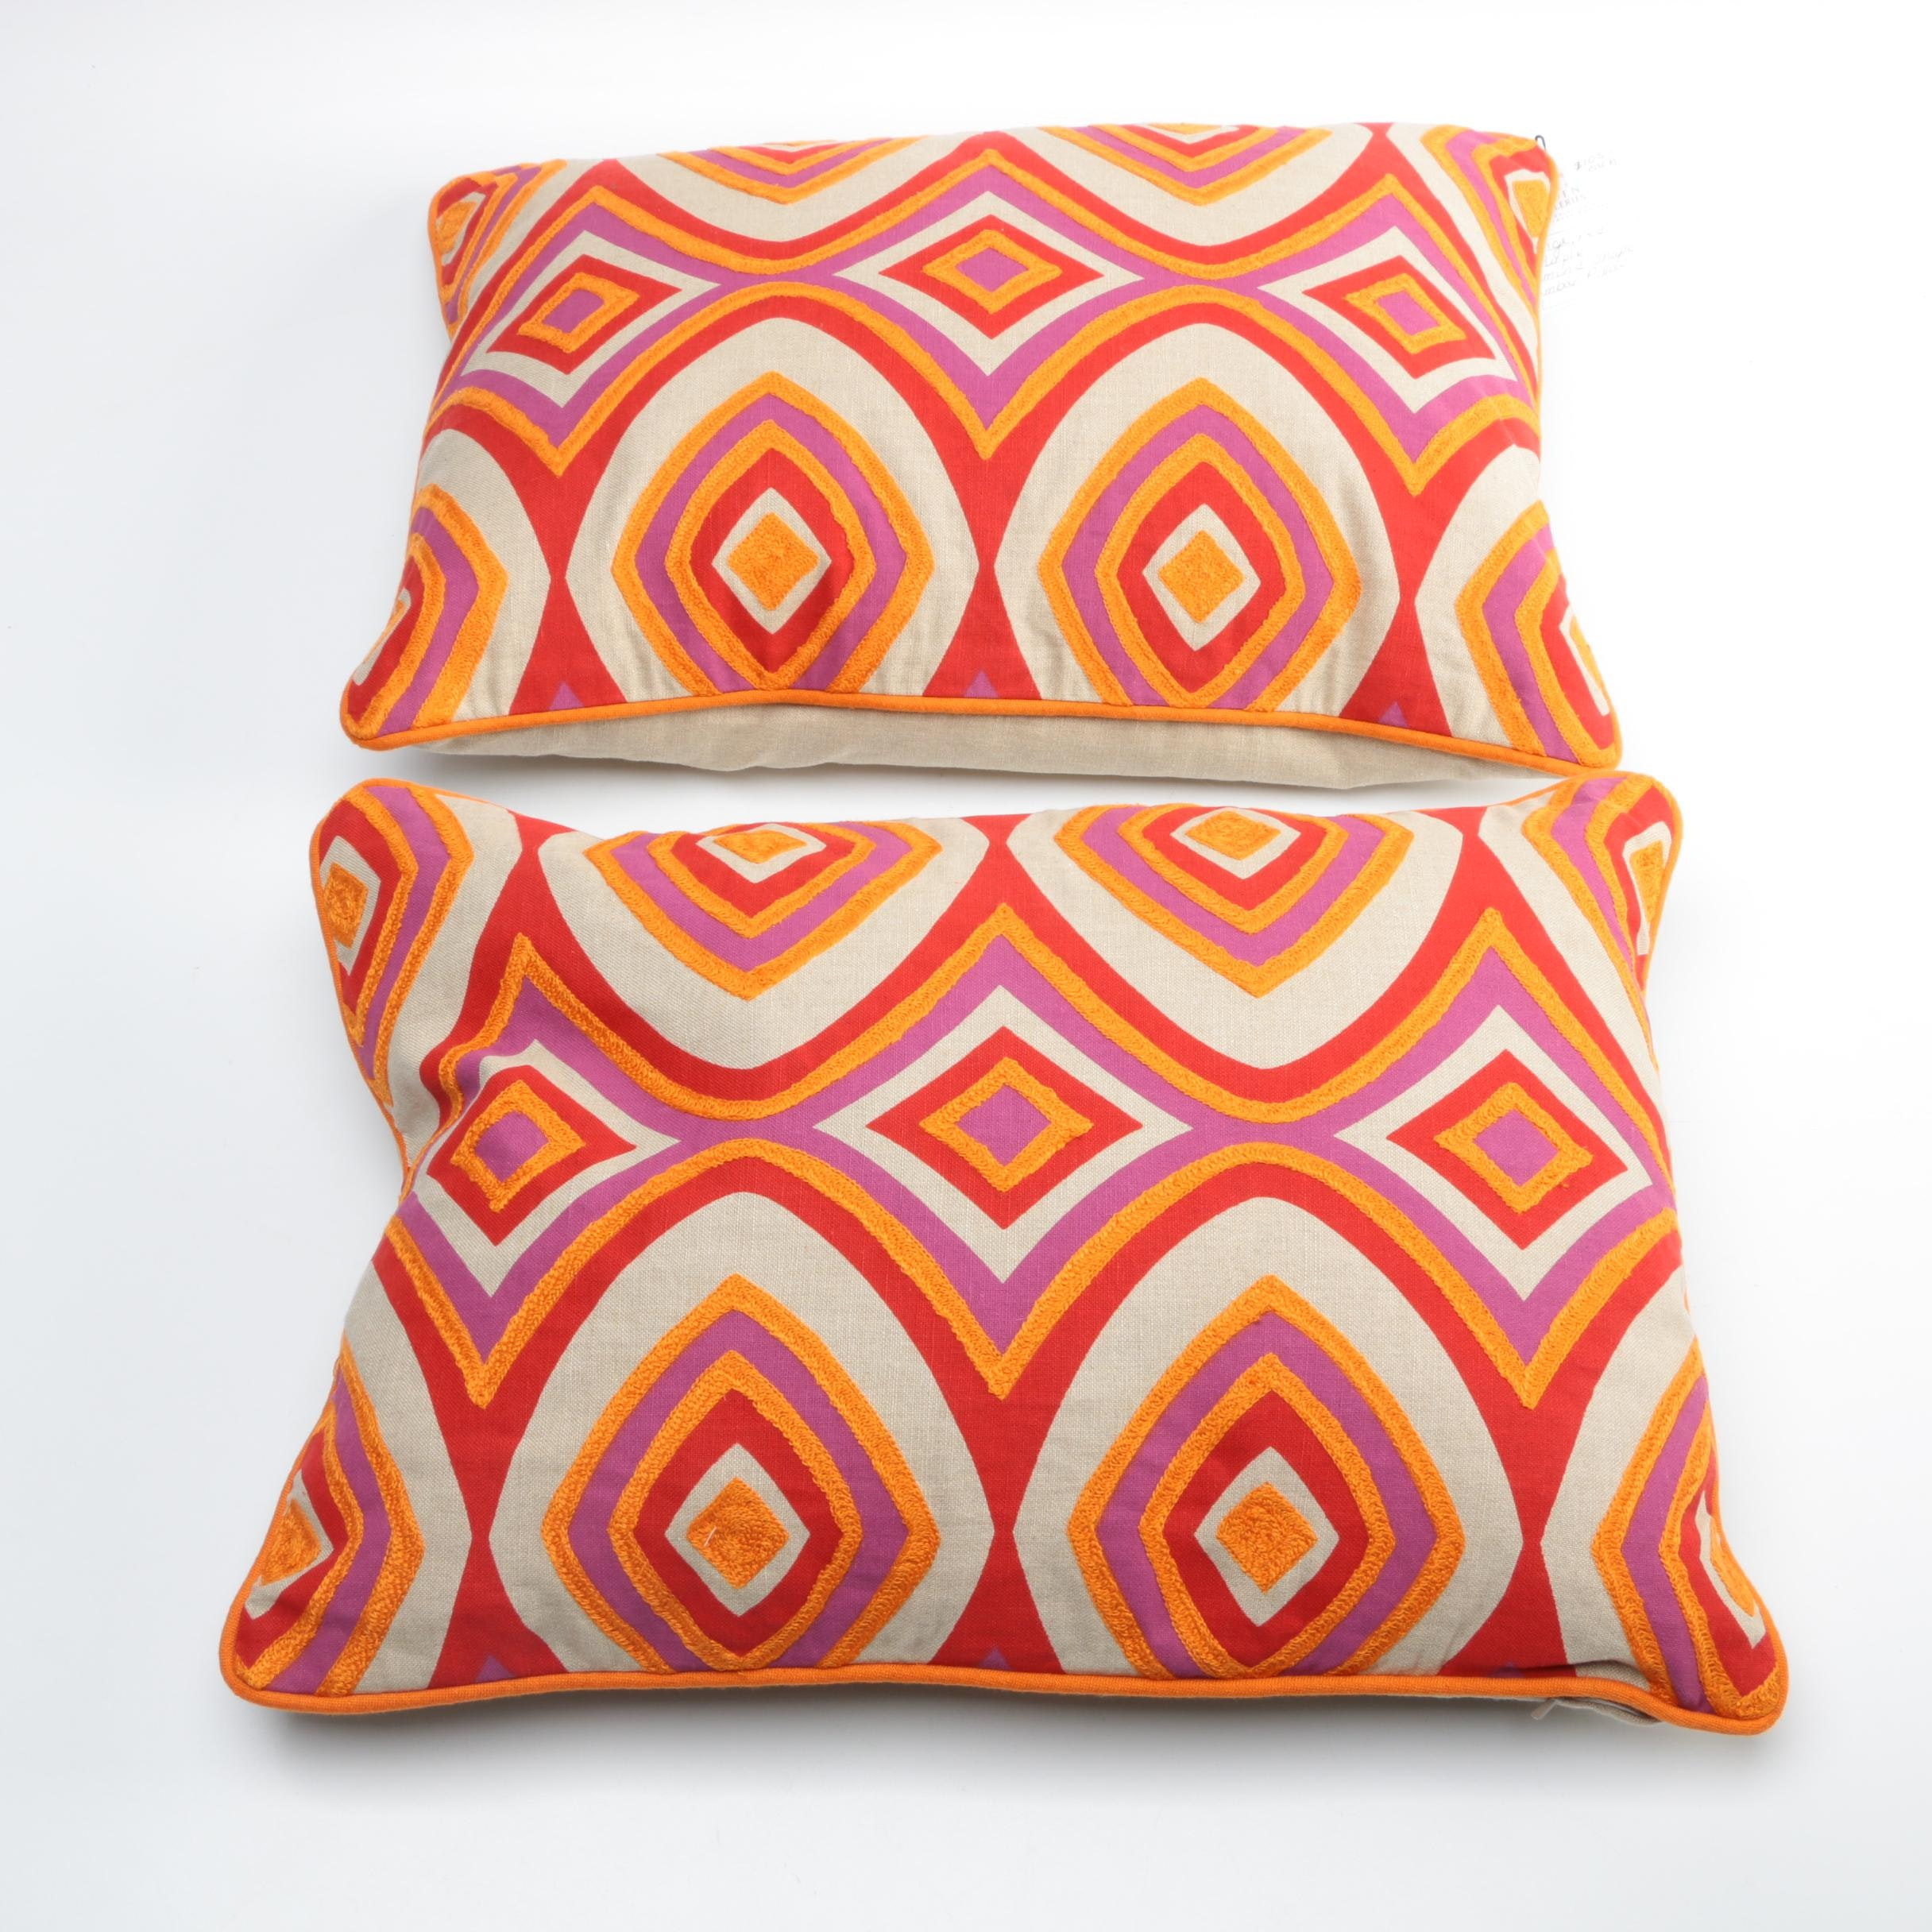 Hiden Galleries Embroidered Canvas Lumbar Pillows